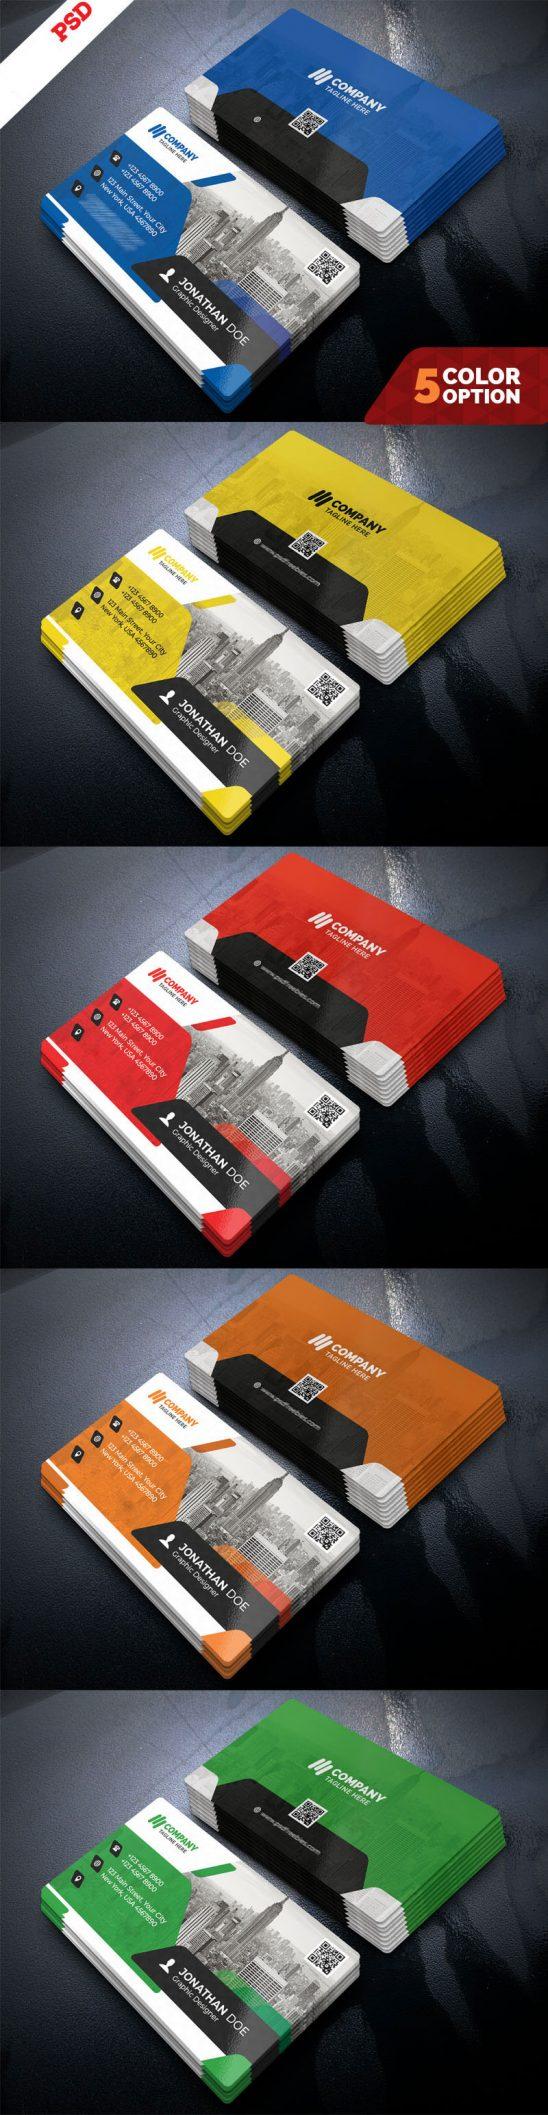 p316 2 548x2115 - لایه باز کارت ویزیت شرکتی و ساختمانی